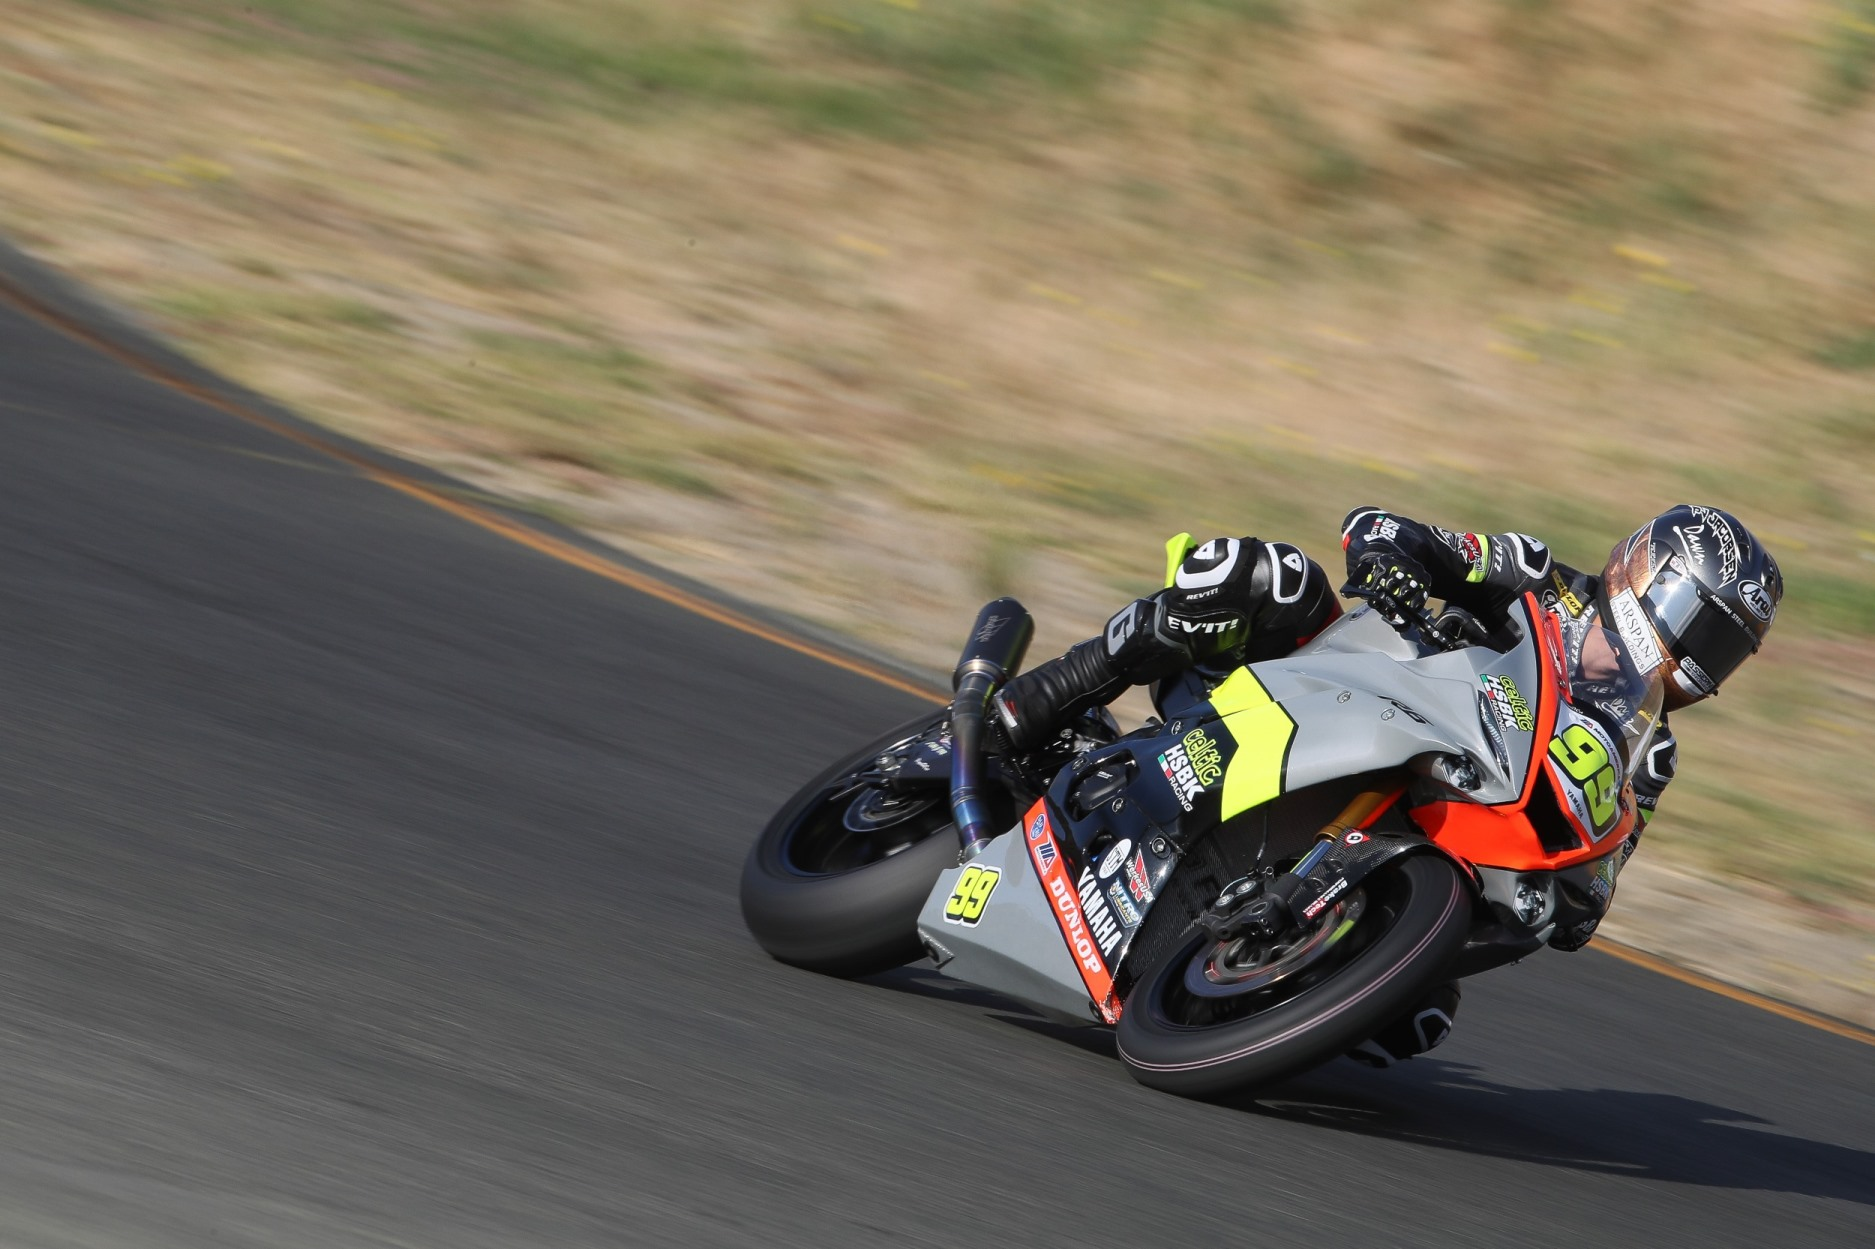 VIDEO: 2019 CELTIC HSBK RACING PJ JACOBSEN DOMINATES MOTOAMERICA RACE 2 AT SONOMA RACEWAY